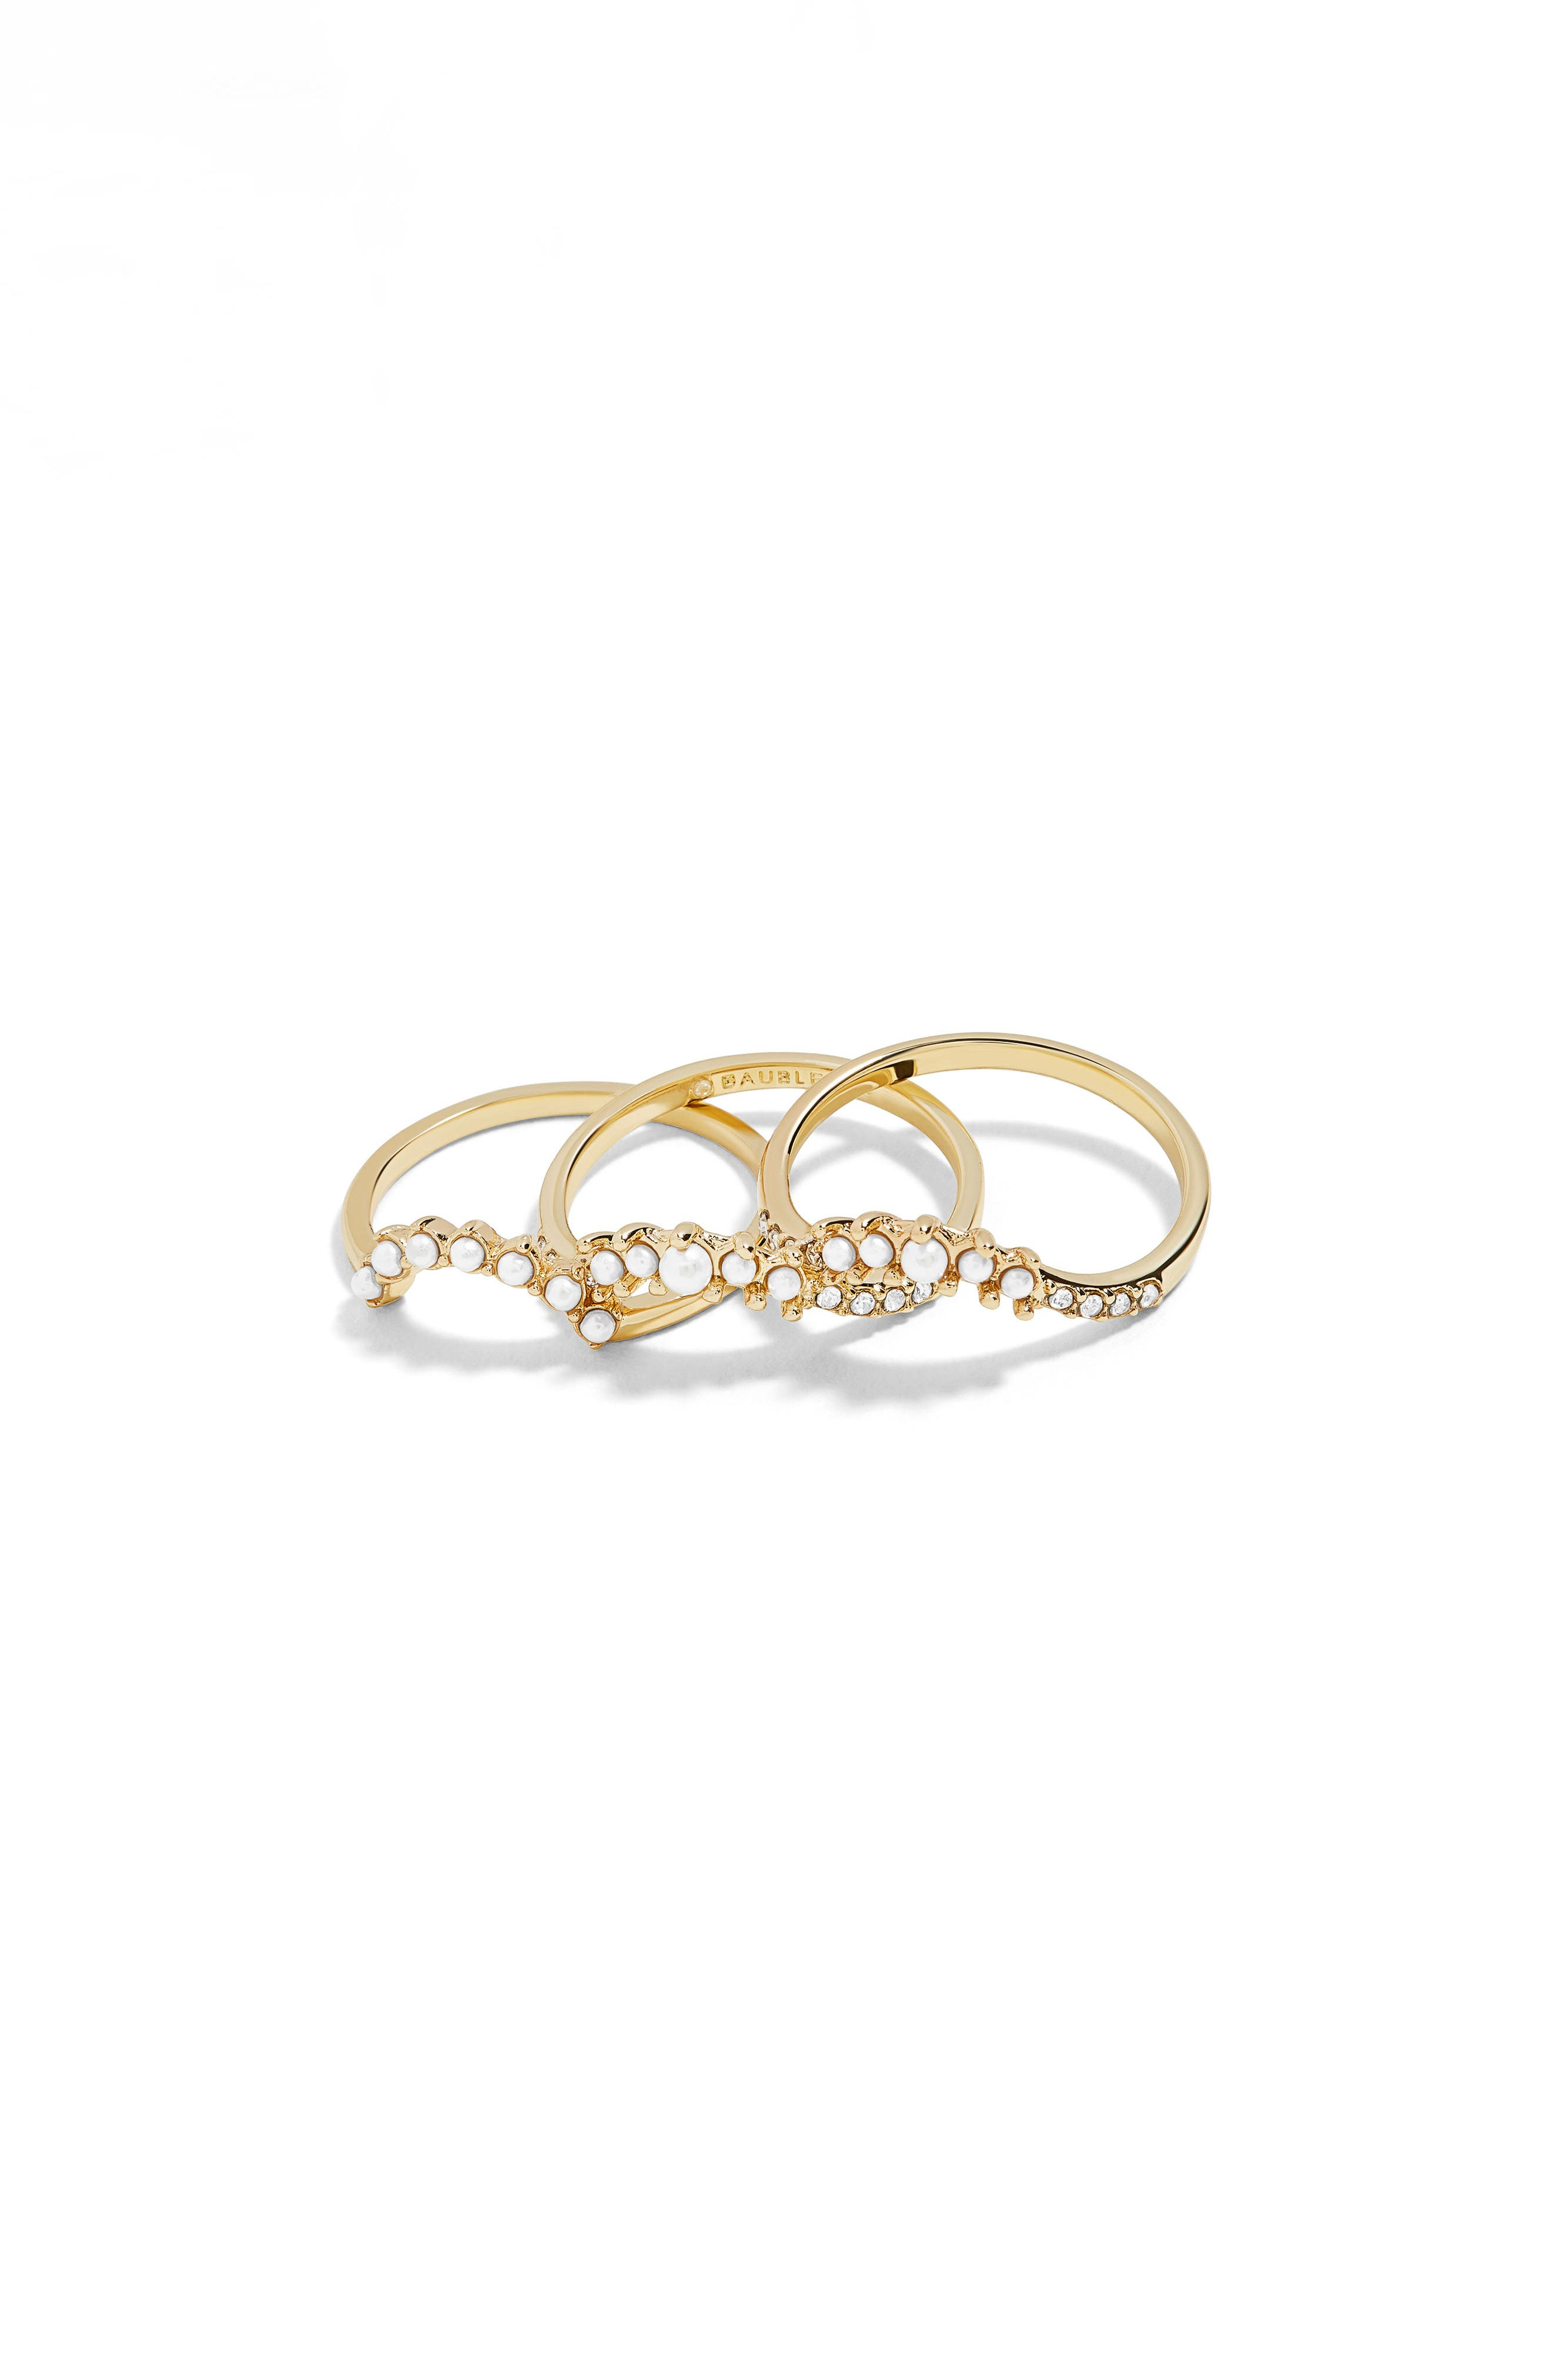 Dynasty Set of 3 Rings,                             Main thumbnail 1, color,                             710